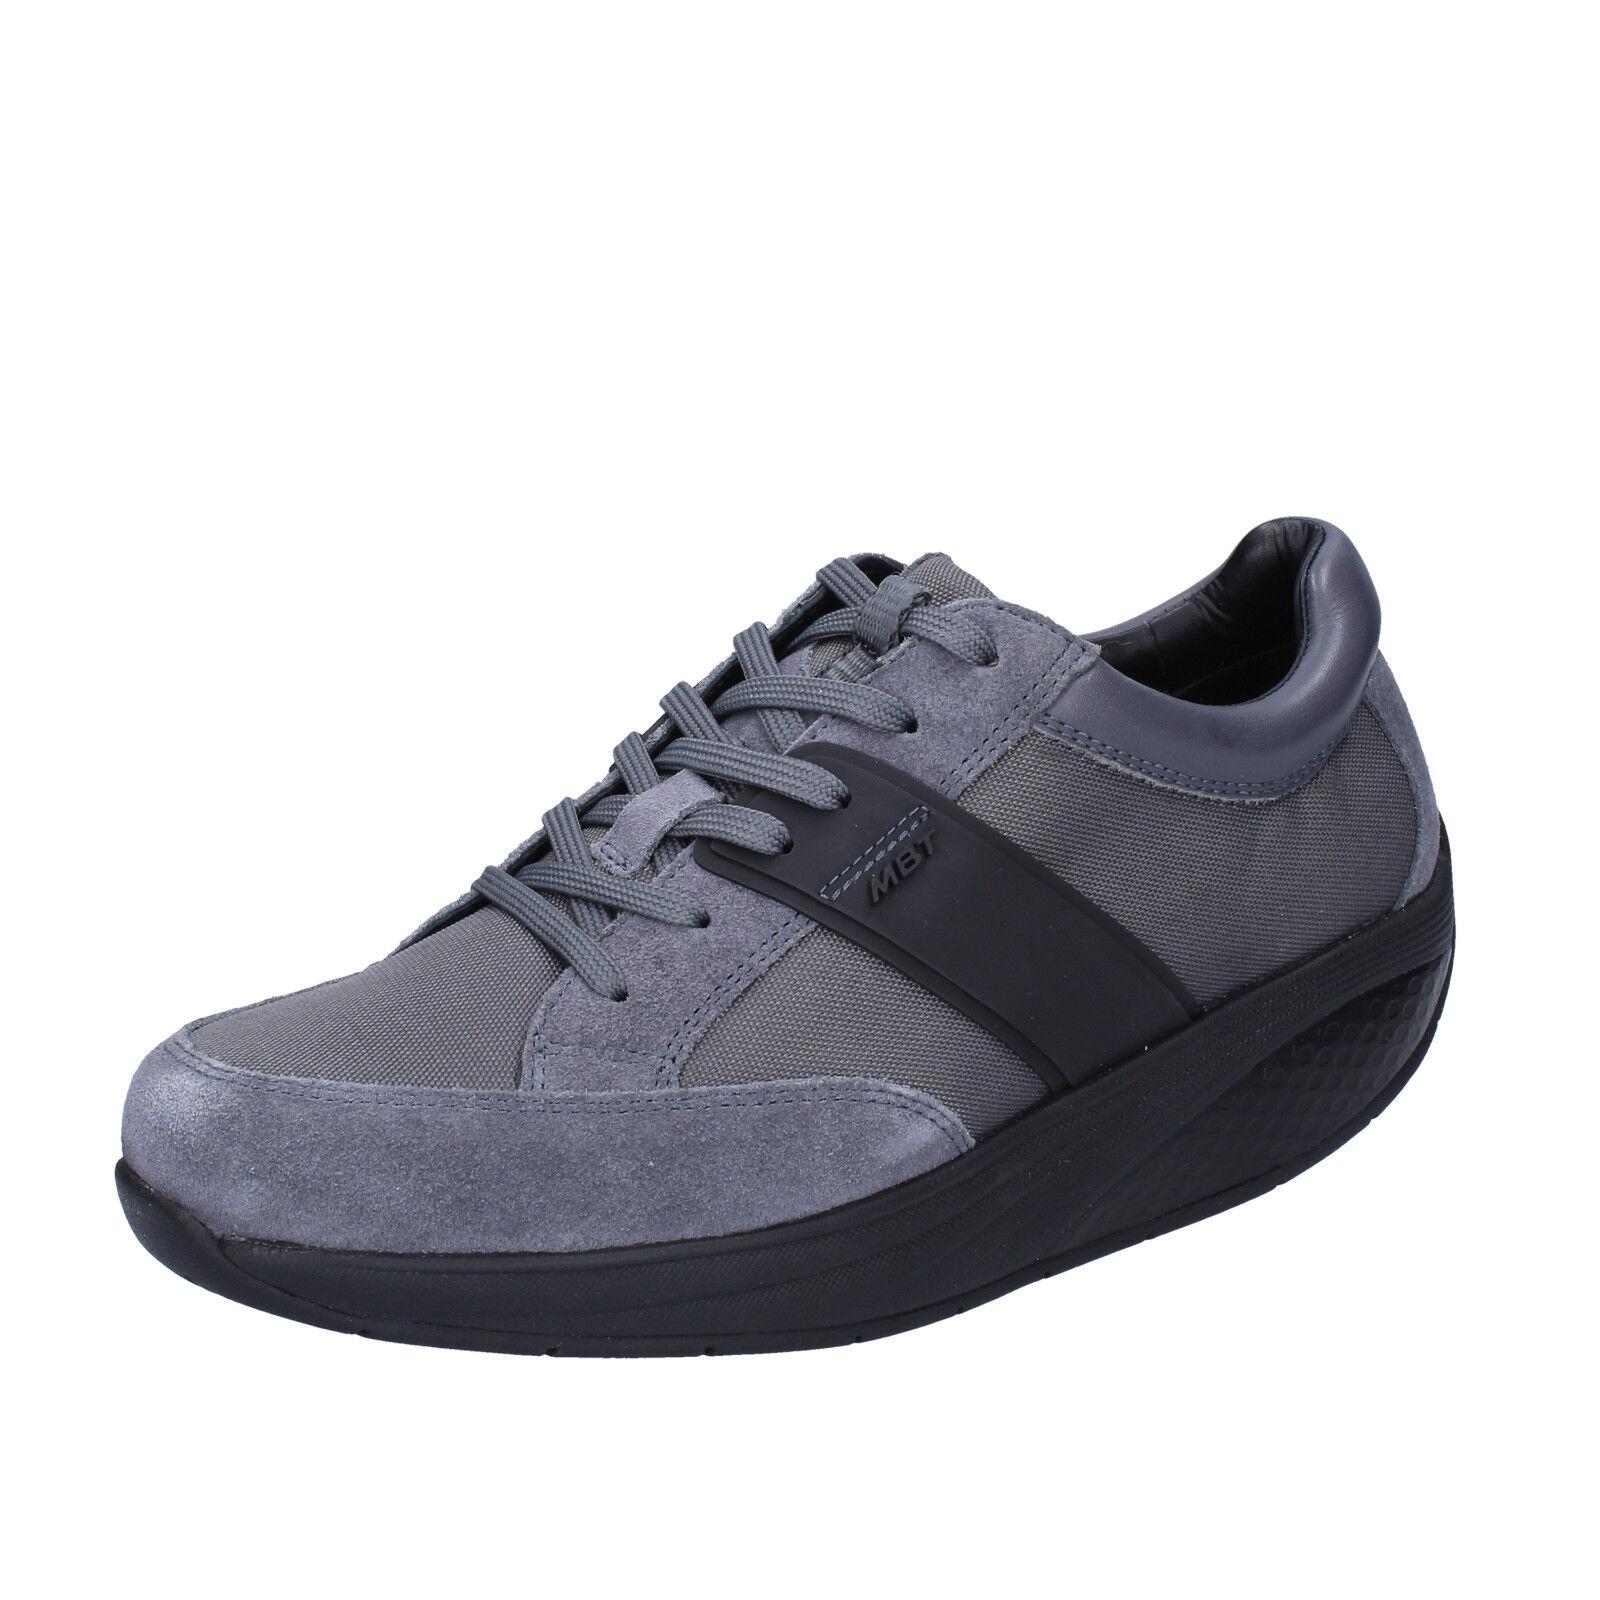 women's shoes MBT 4 / 4,5 () sneakers gray textile suede BT41-35